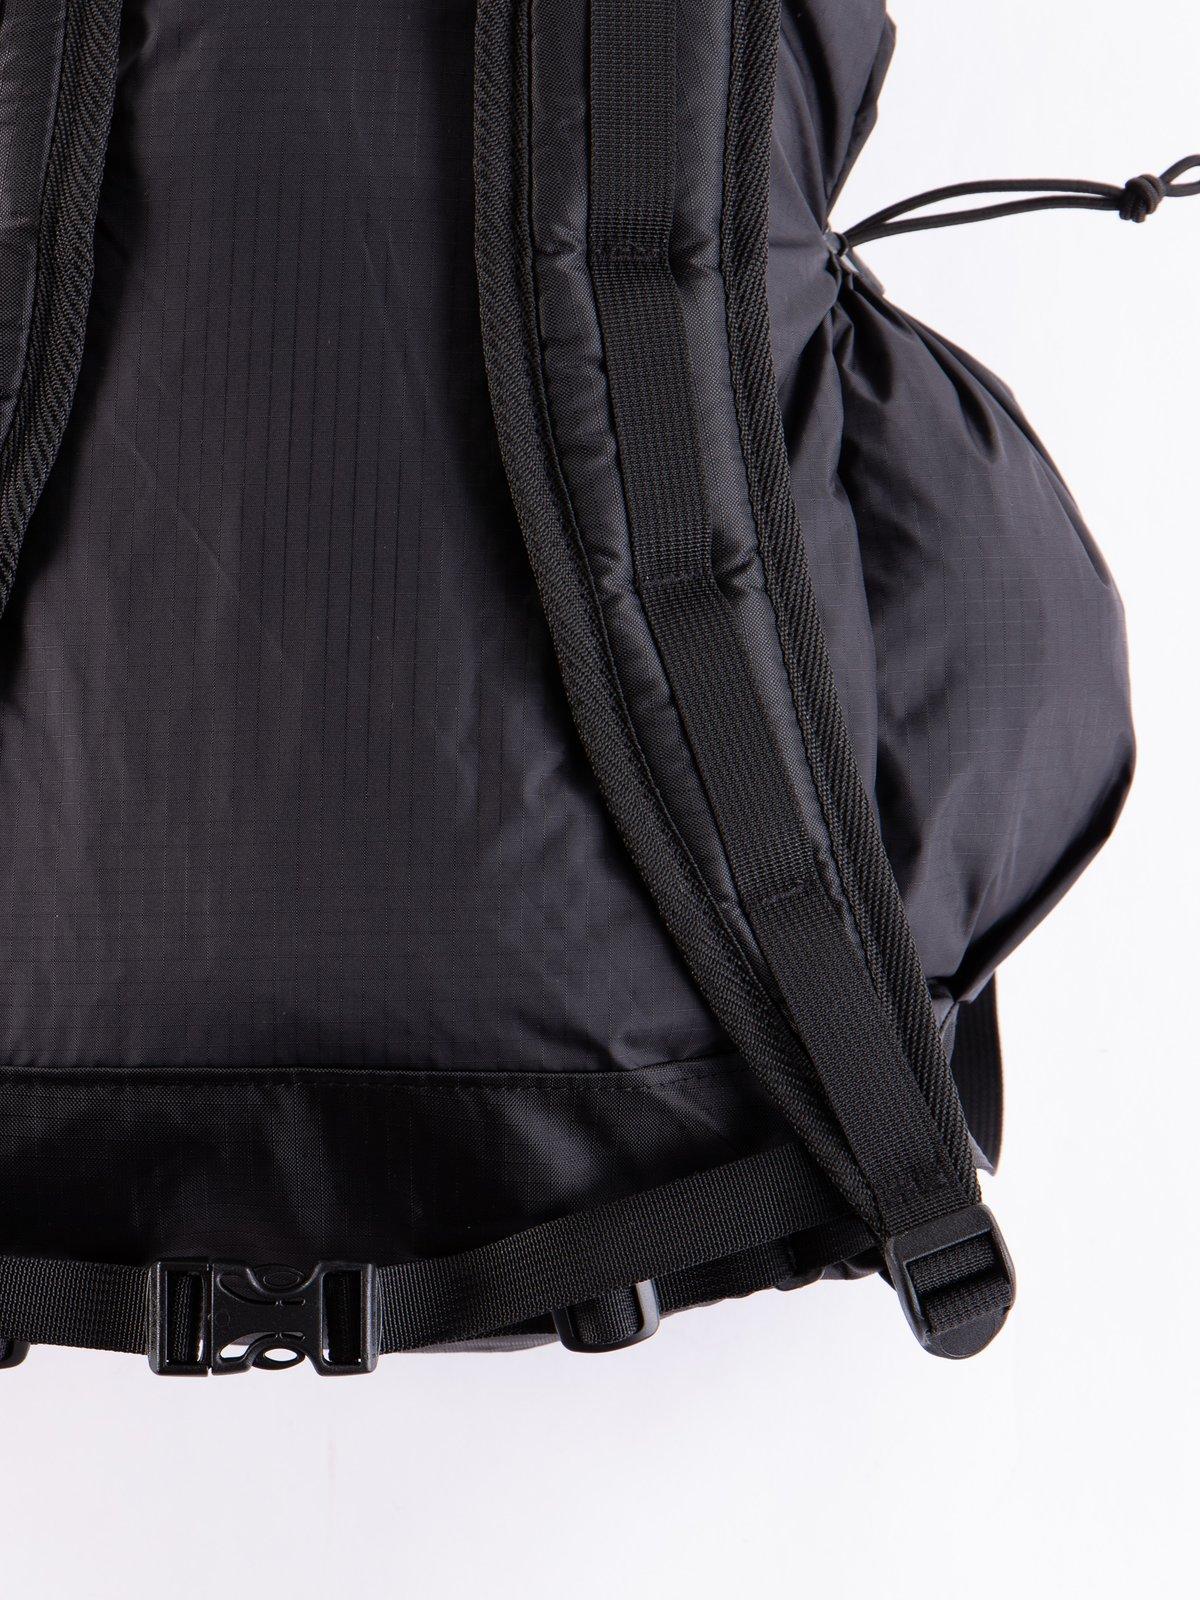 Black Nylon Ripstop UL Backpack - Image 4